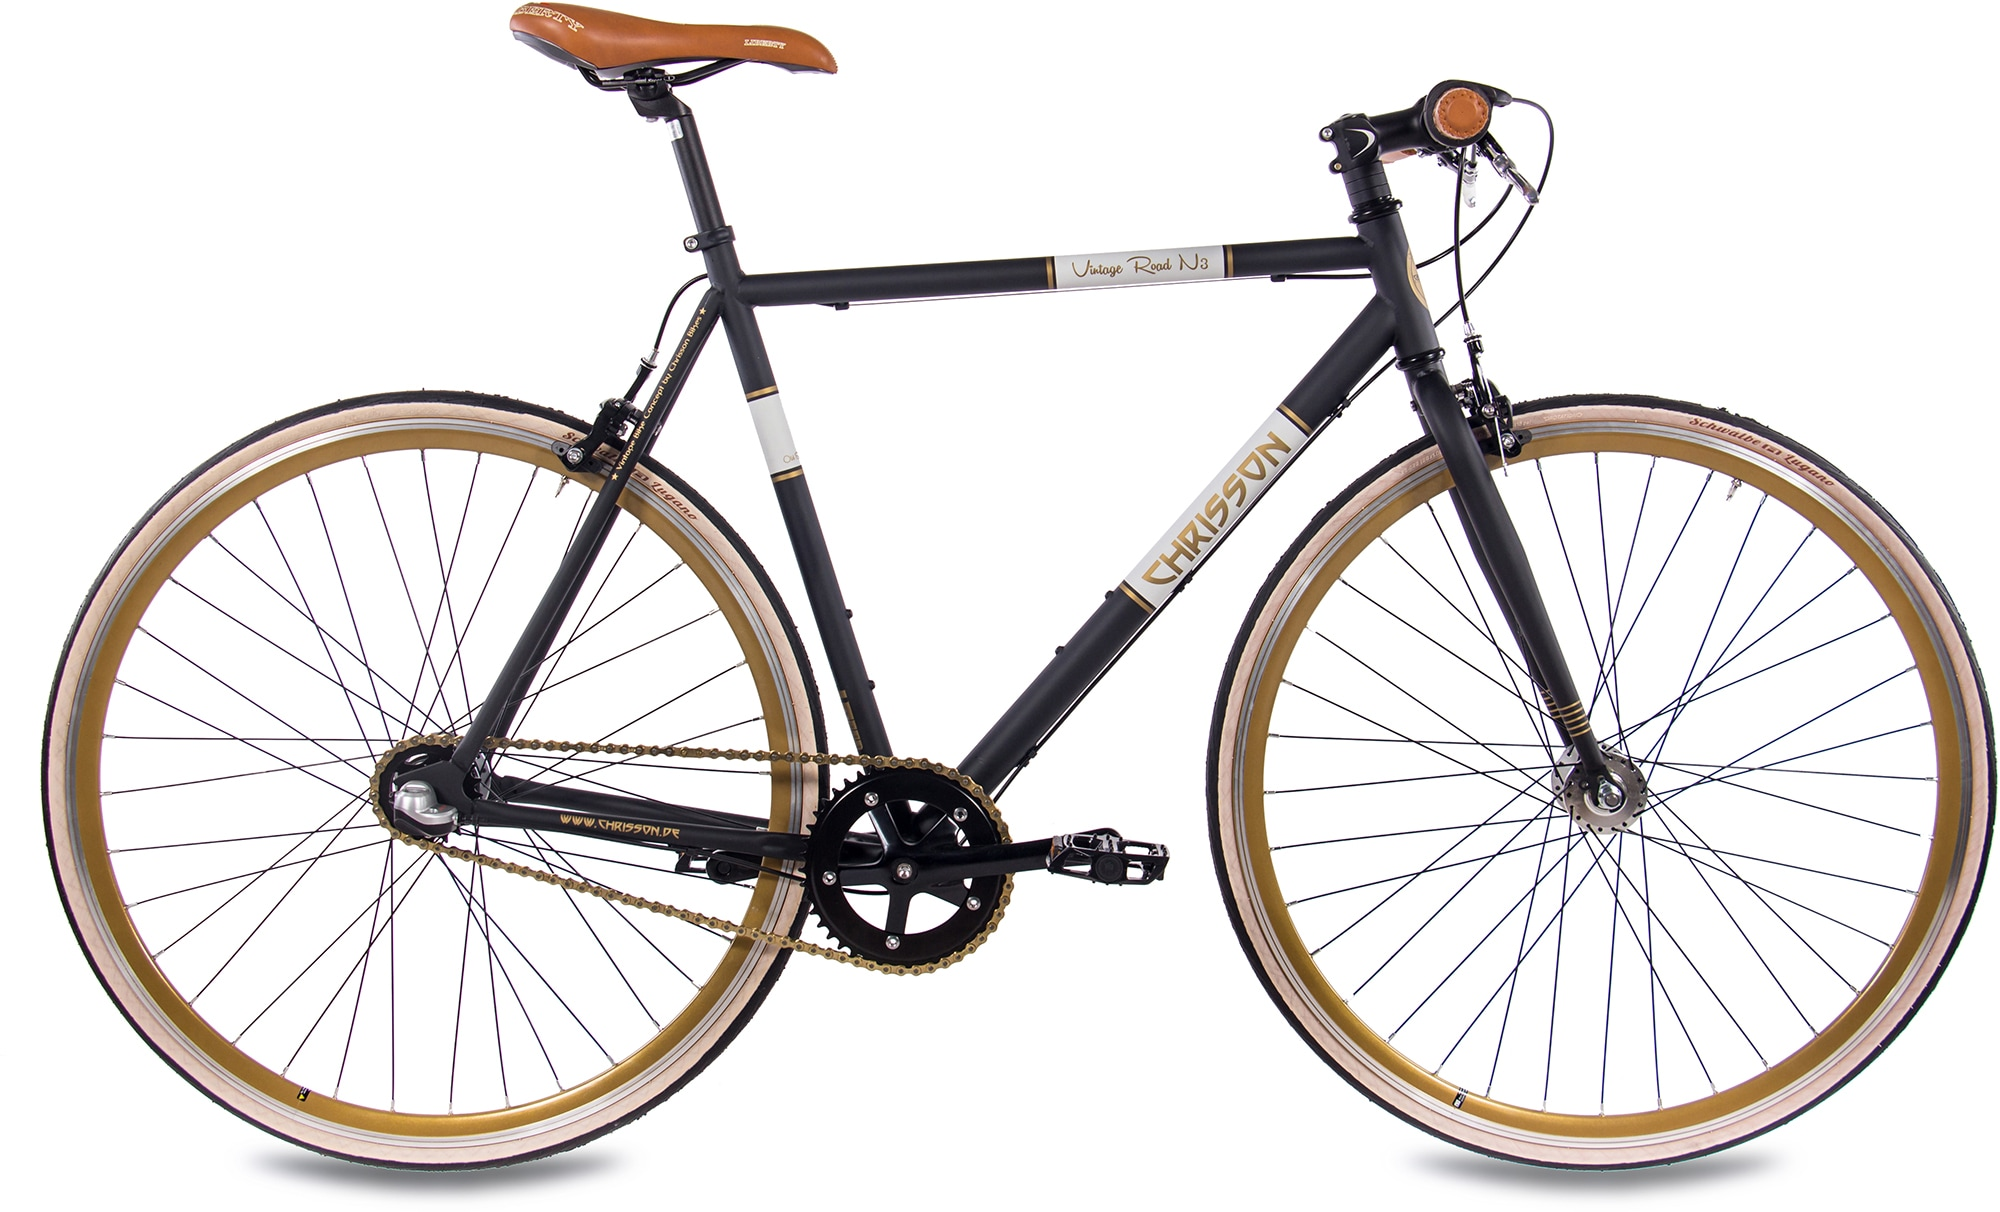 Chrisson Urbanbike Vintage Road N3, 3 Gang Shimano Nabenschaltung (1-tlg.) schwarz Crossräder Fahrräder Zubehör Fahrrad